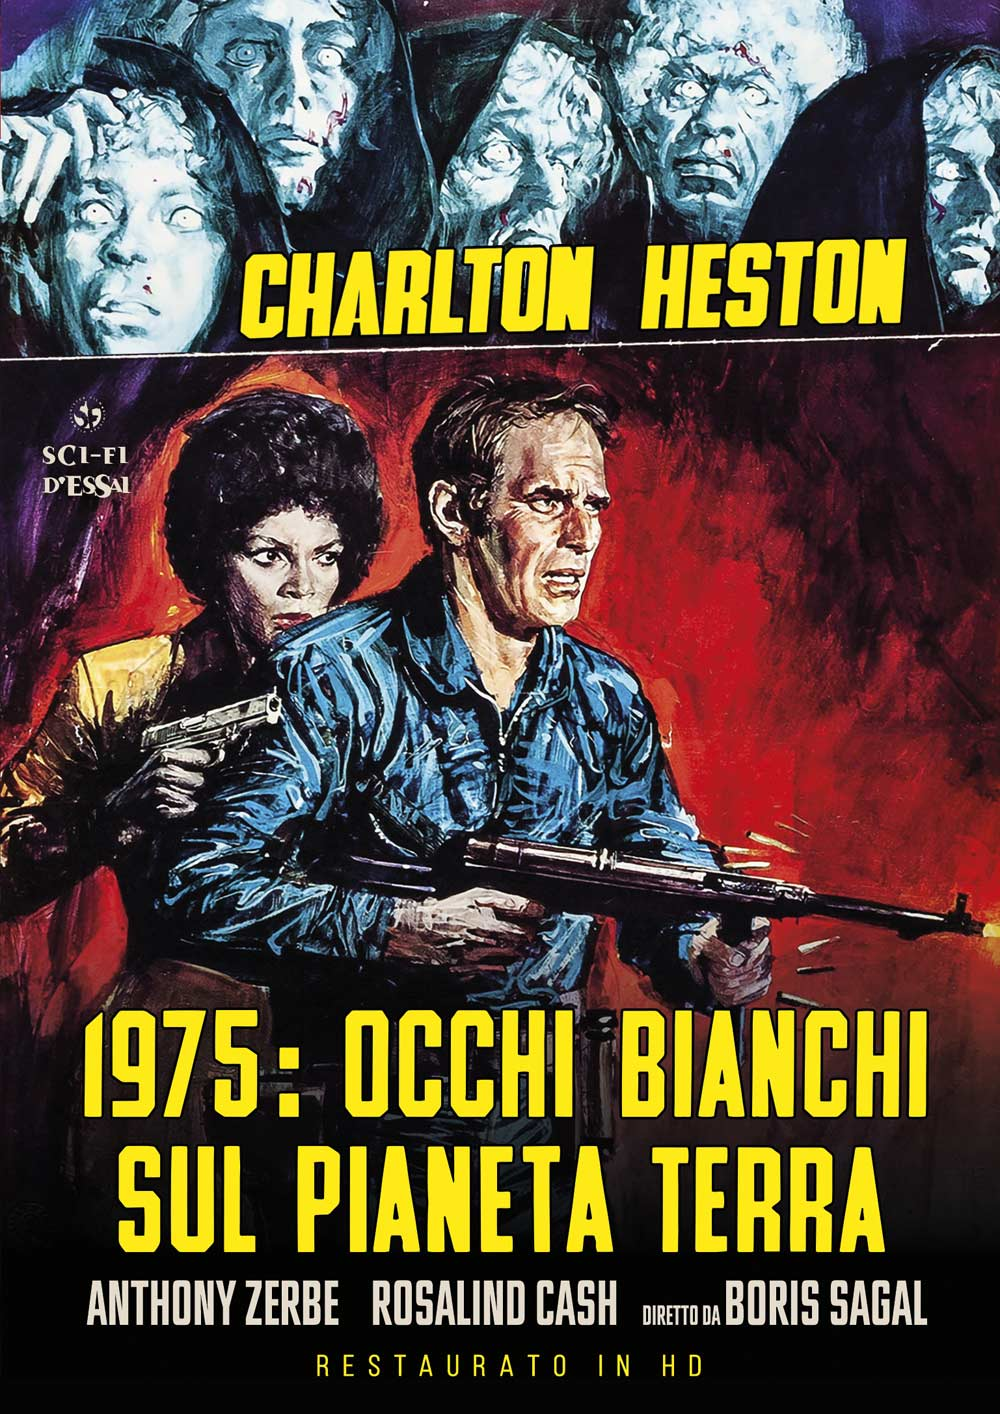 1975 OCCHI BIANCHI SUL PIANETA TERRA (RESTAURATO IN HD) (DVD)